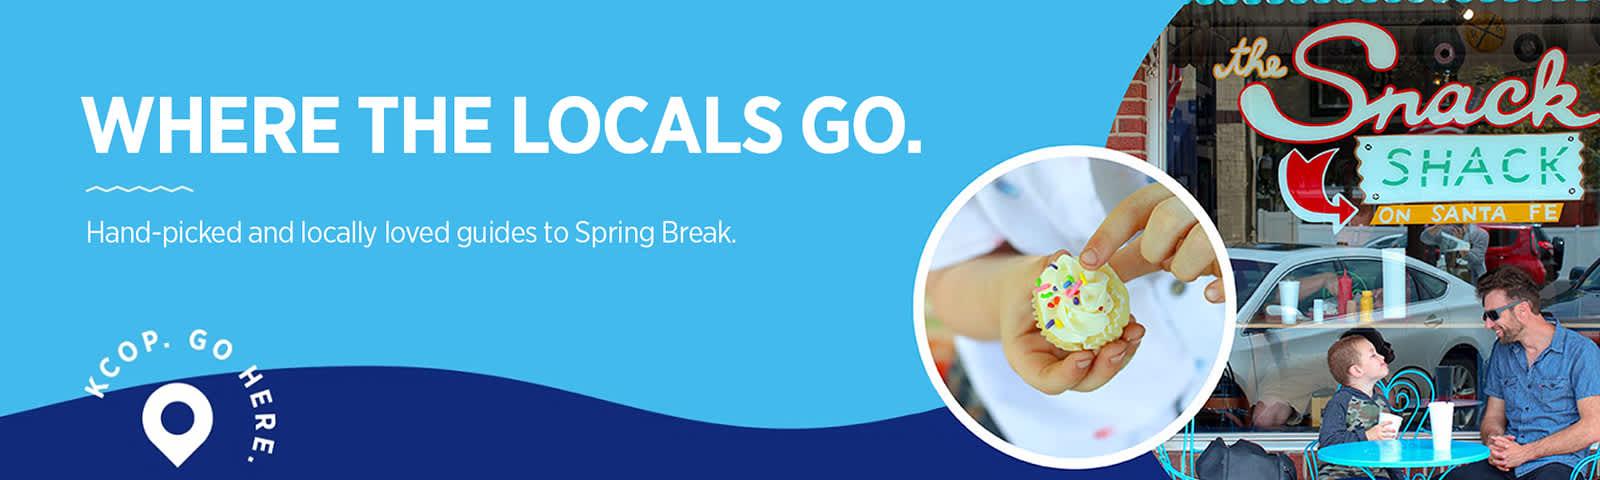 Where-The-Locals-Go-Overland-Park-Spring-Break